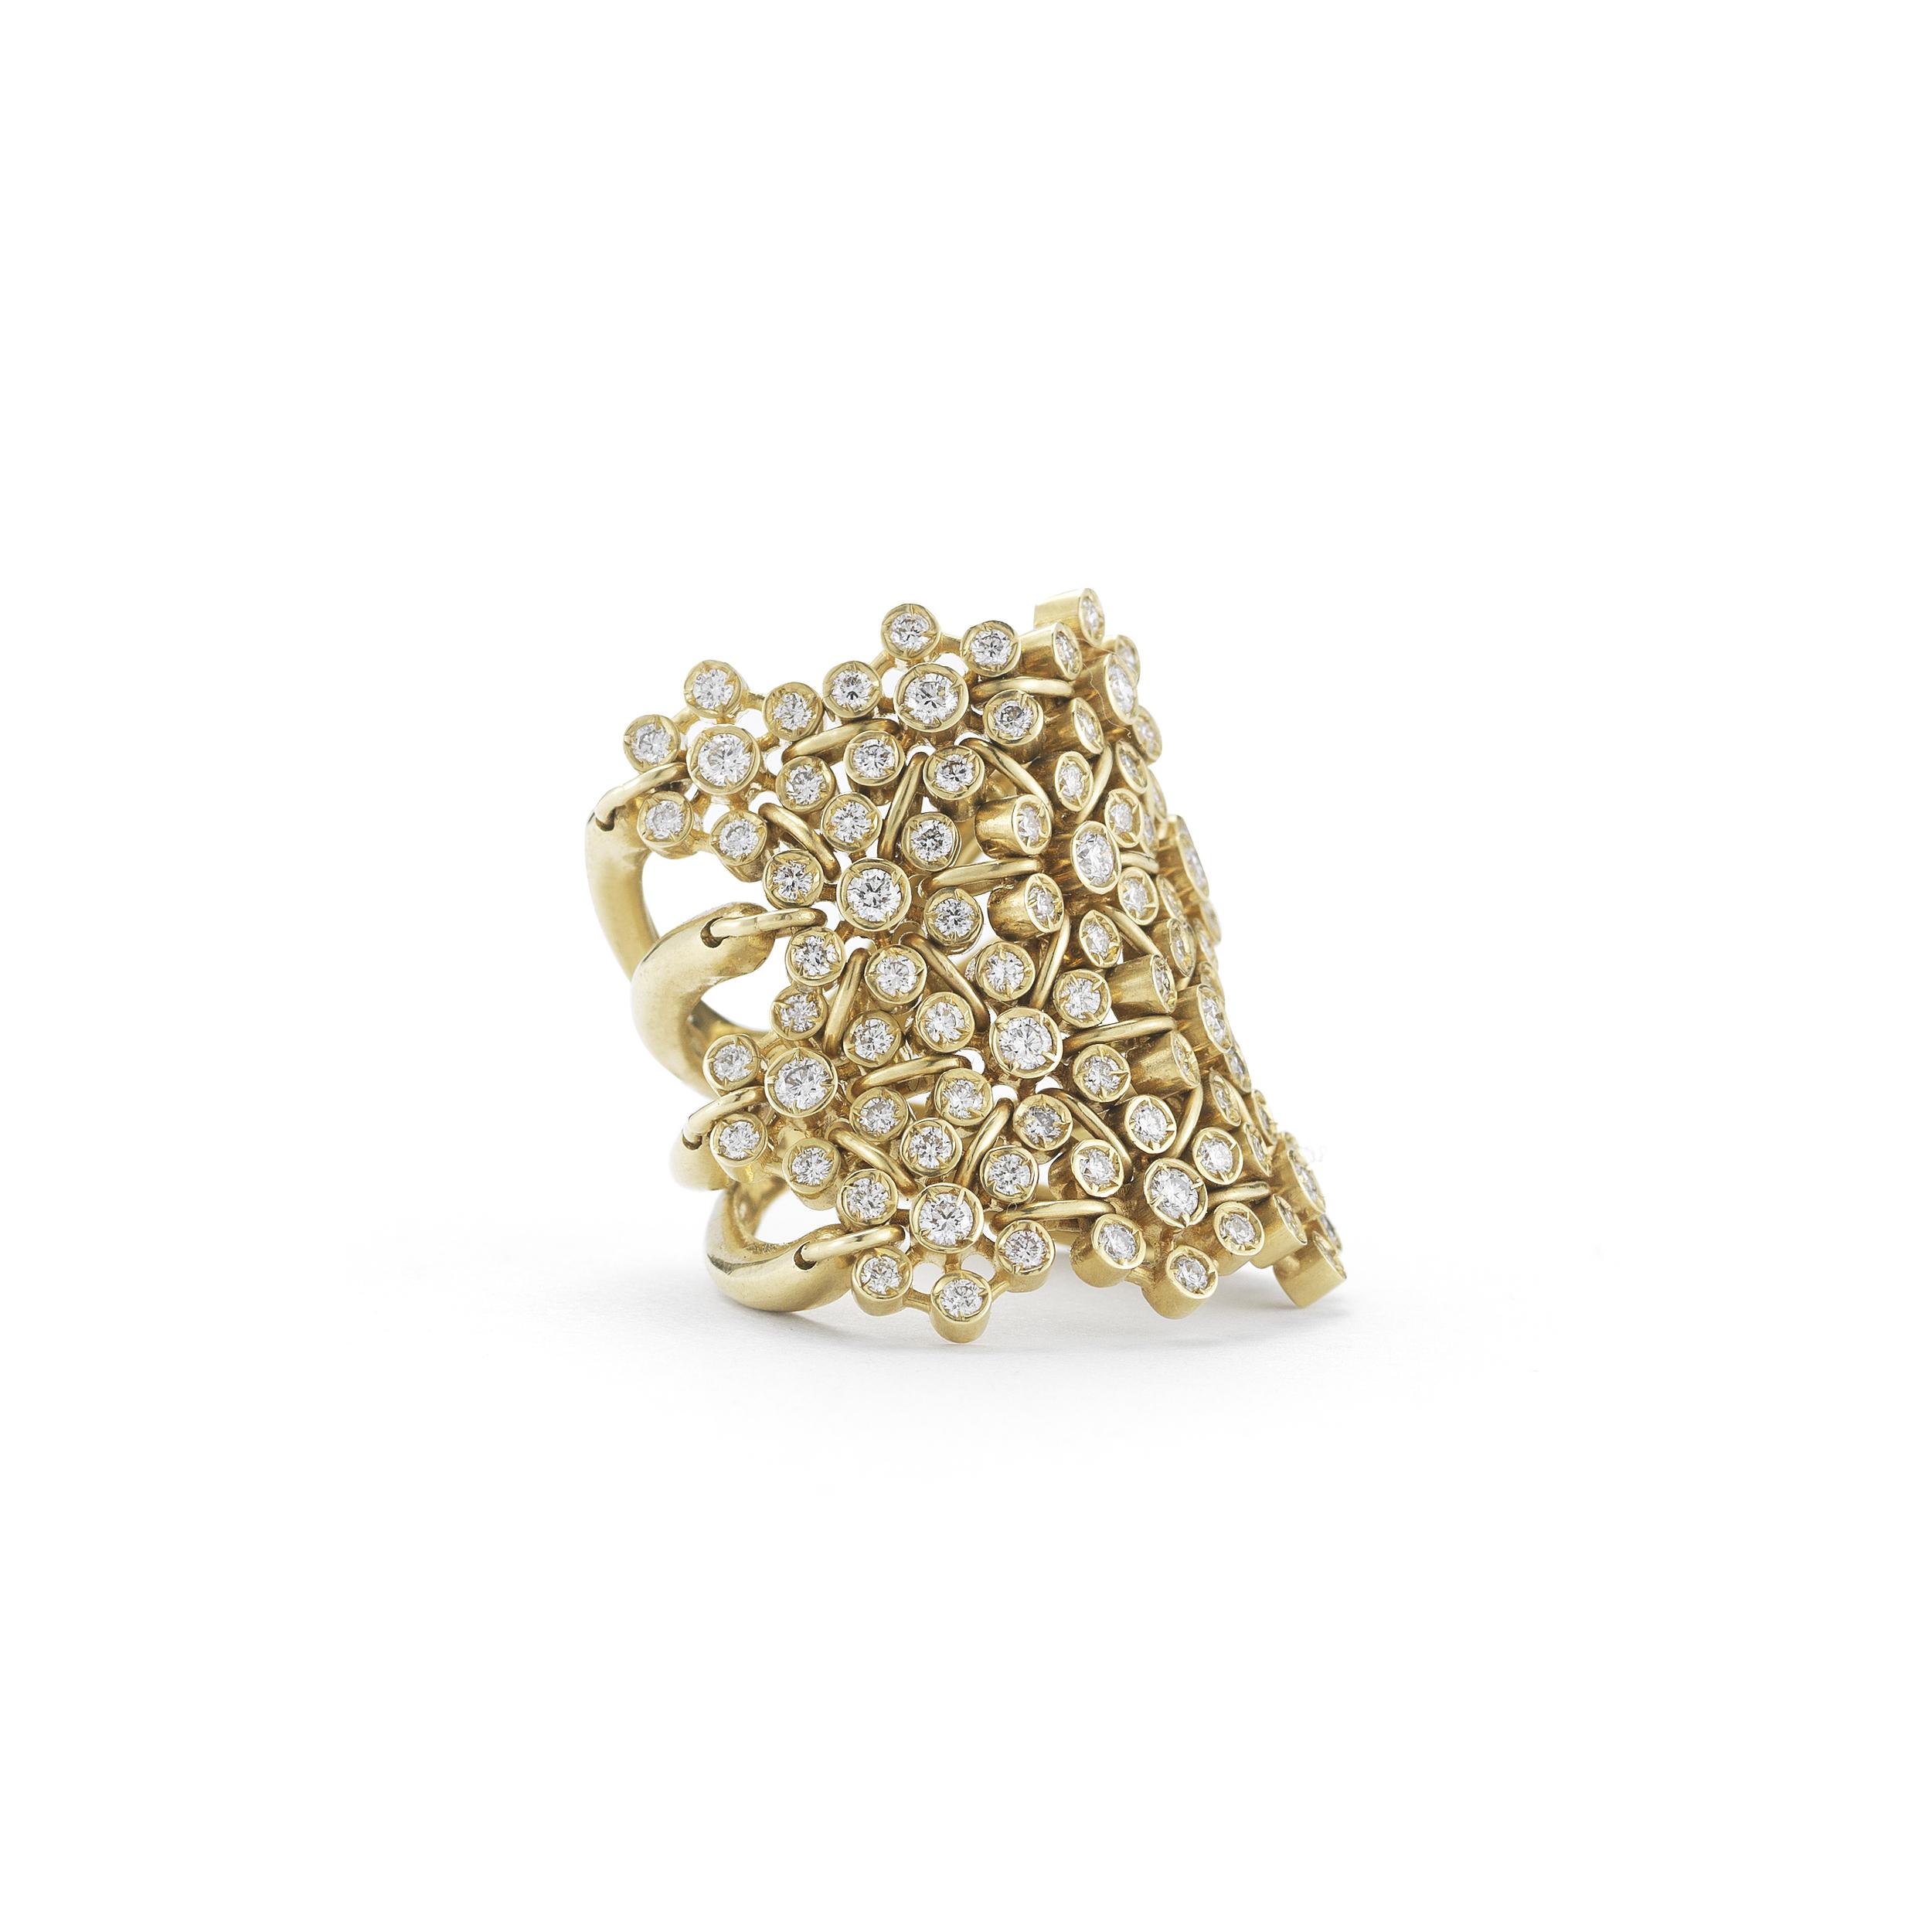 JT2038R-YG_Flower Ring_14k_Yellow Gold_Ring_Jade Trau.jpg